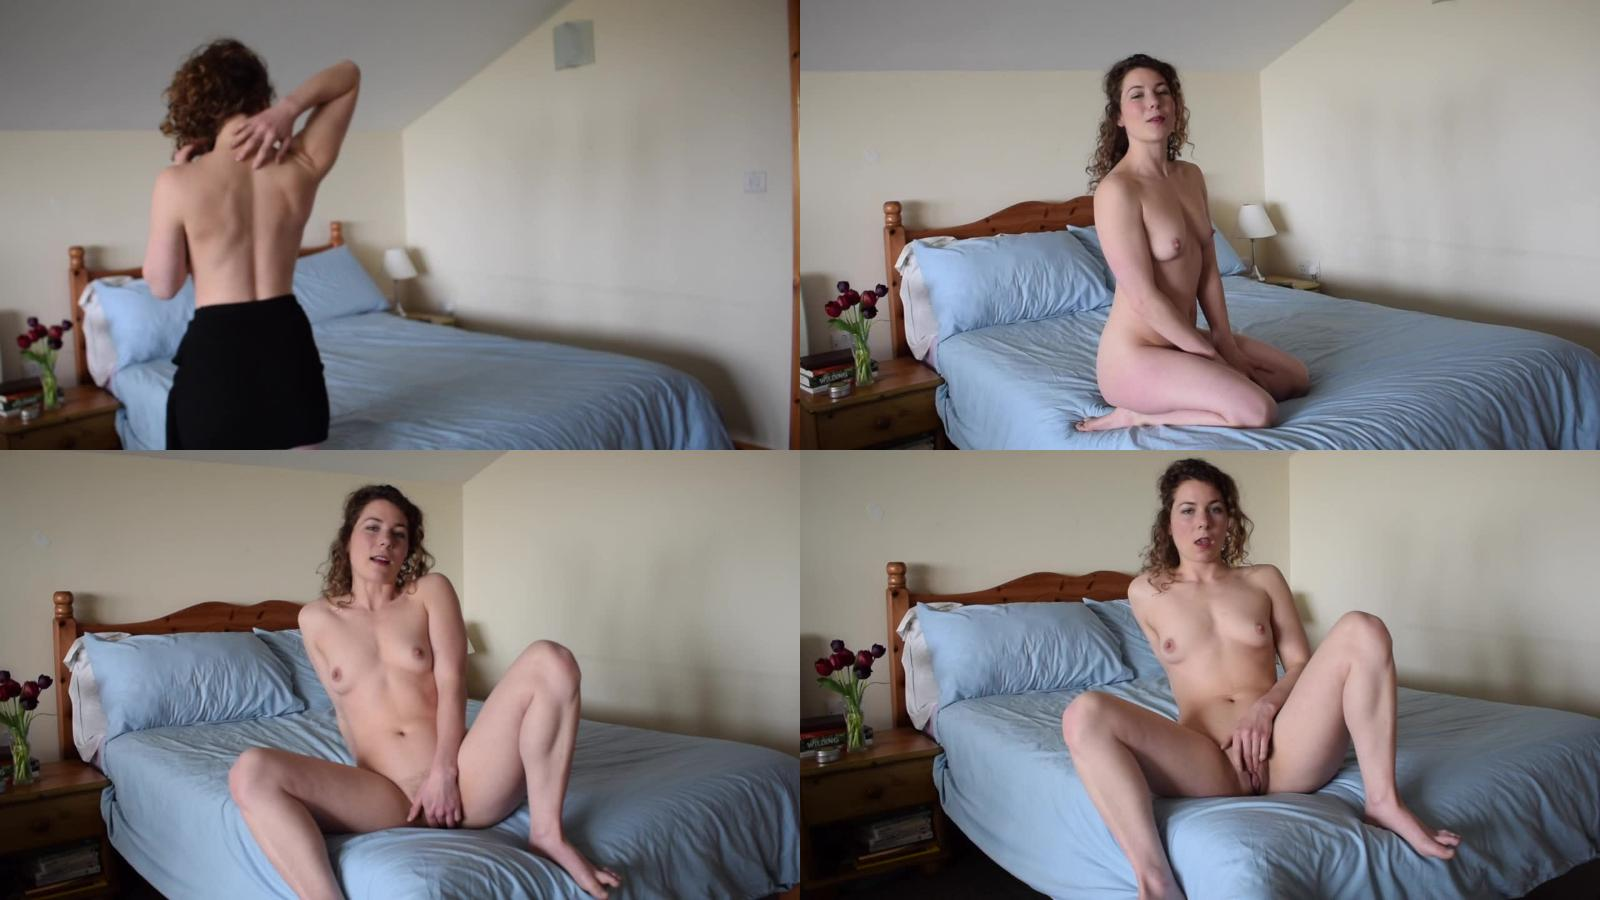 Mean ratings of sexual arousal